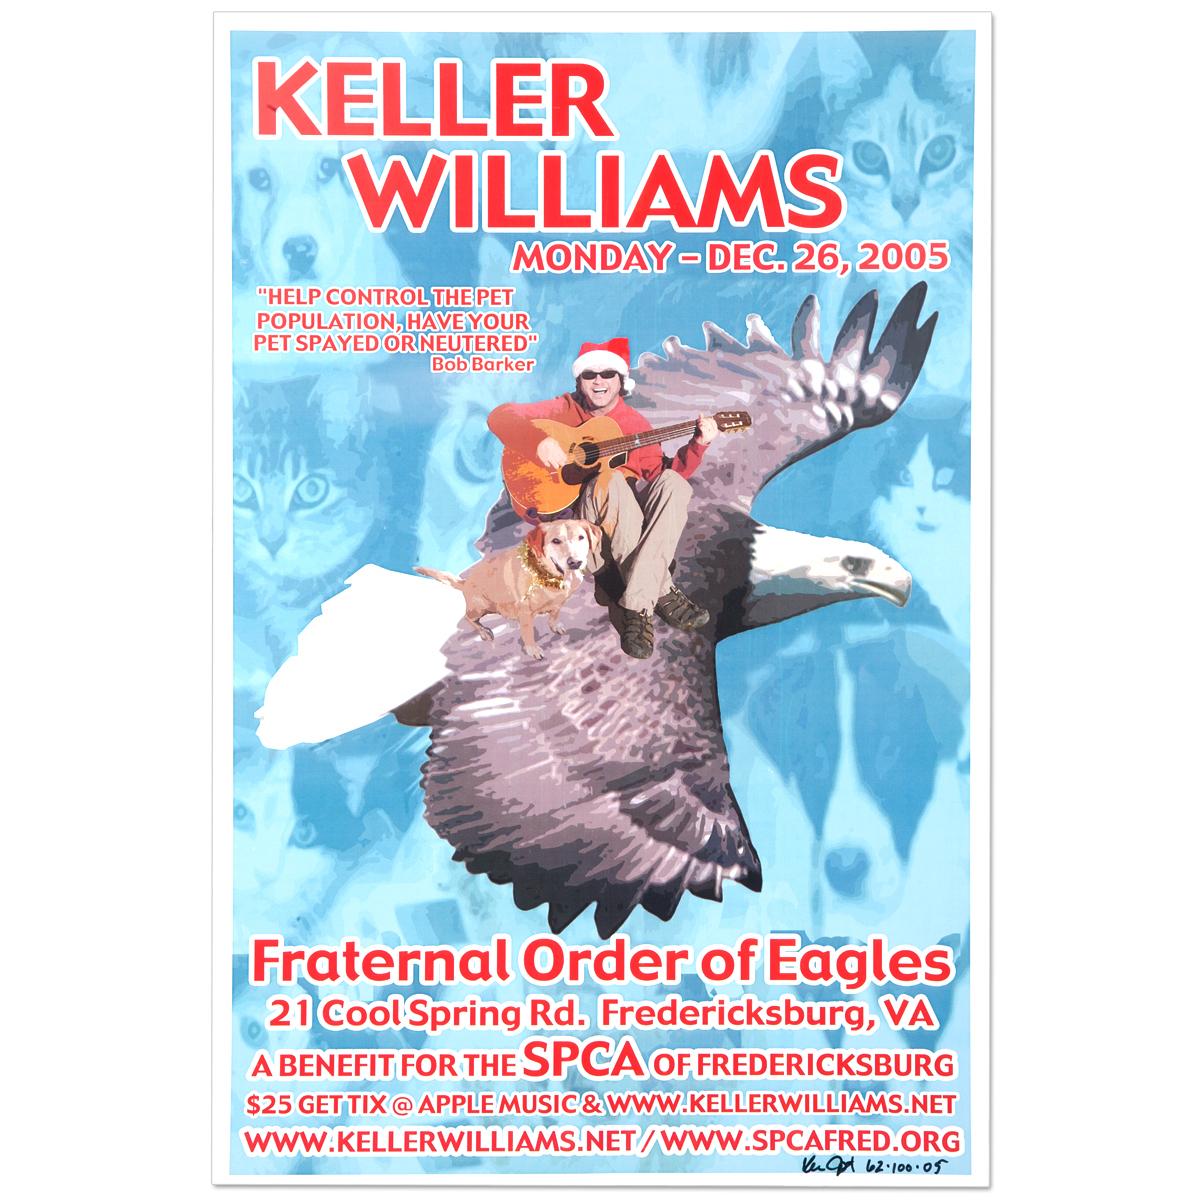 Keller Williams Fredericksburg, VA 12/26/05 Event Poster